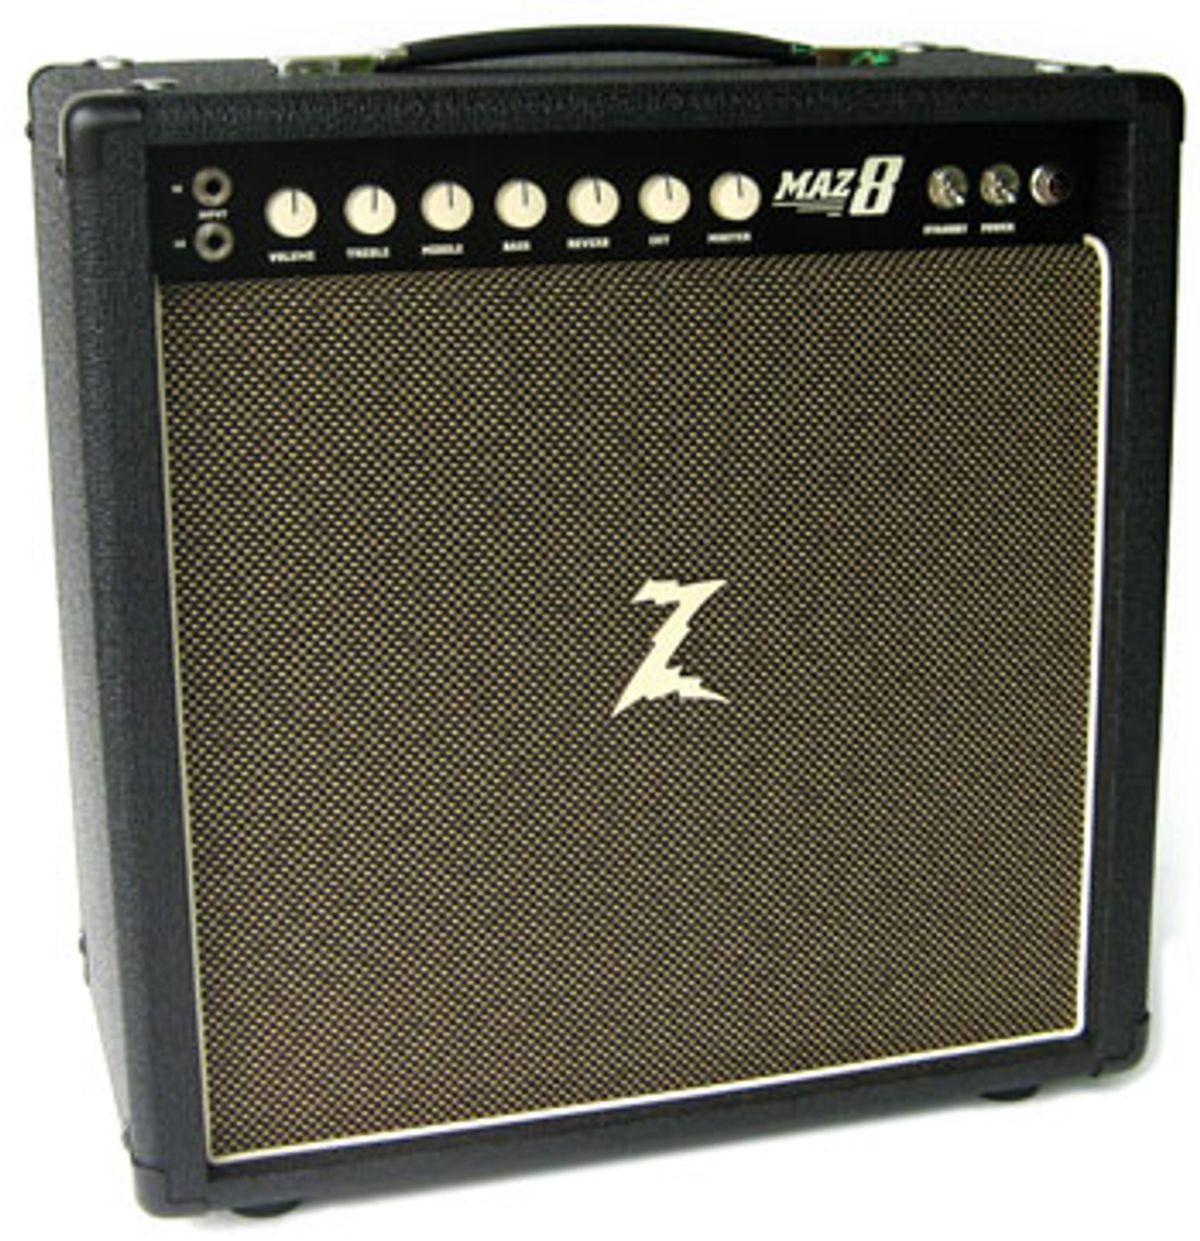 Dr. Z Releases Maz 8 Amp